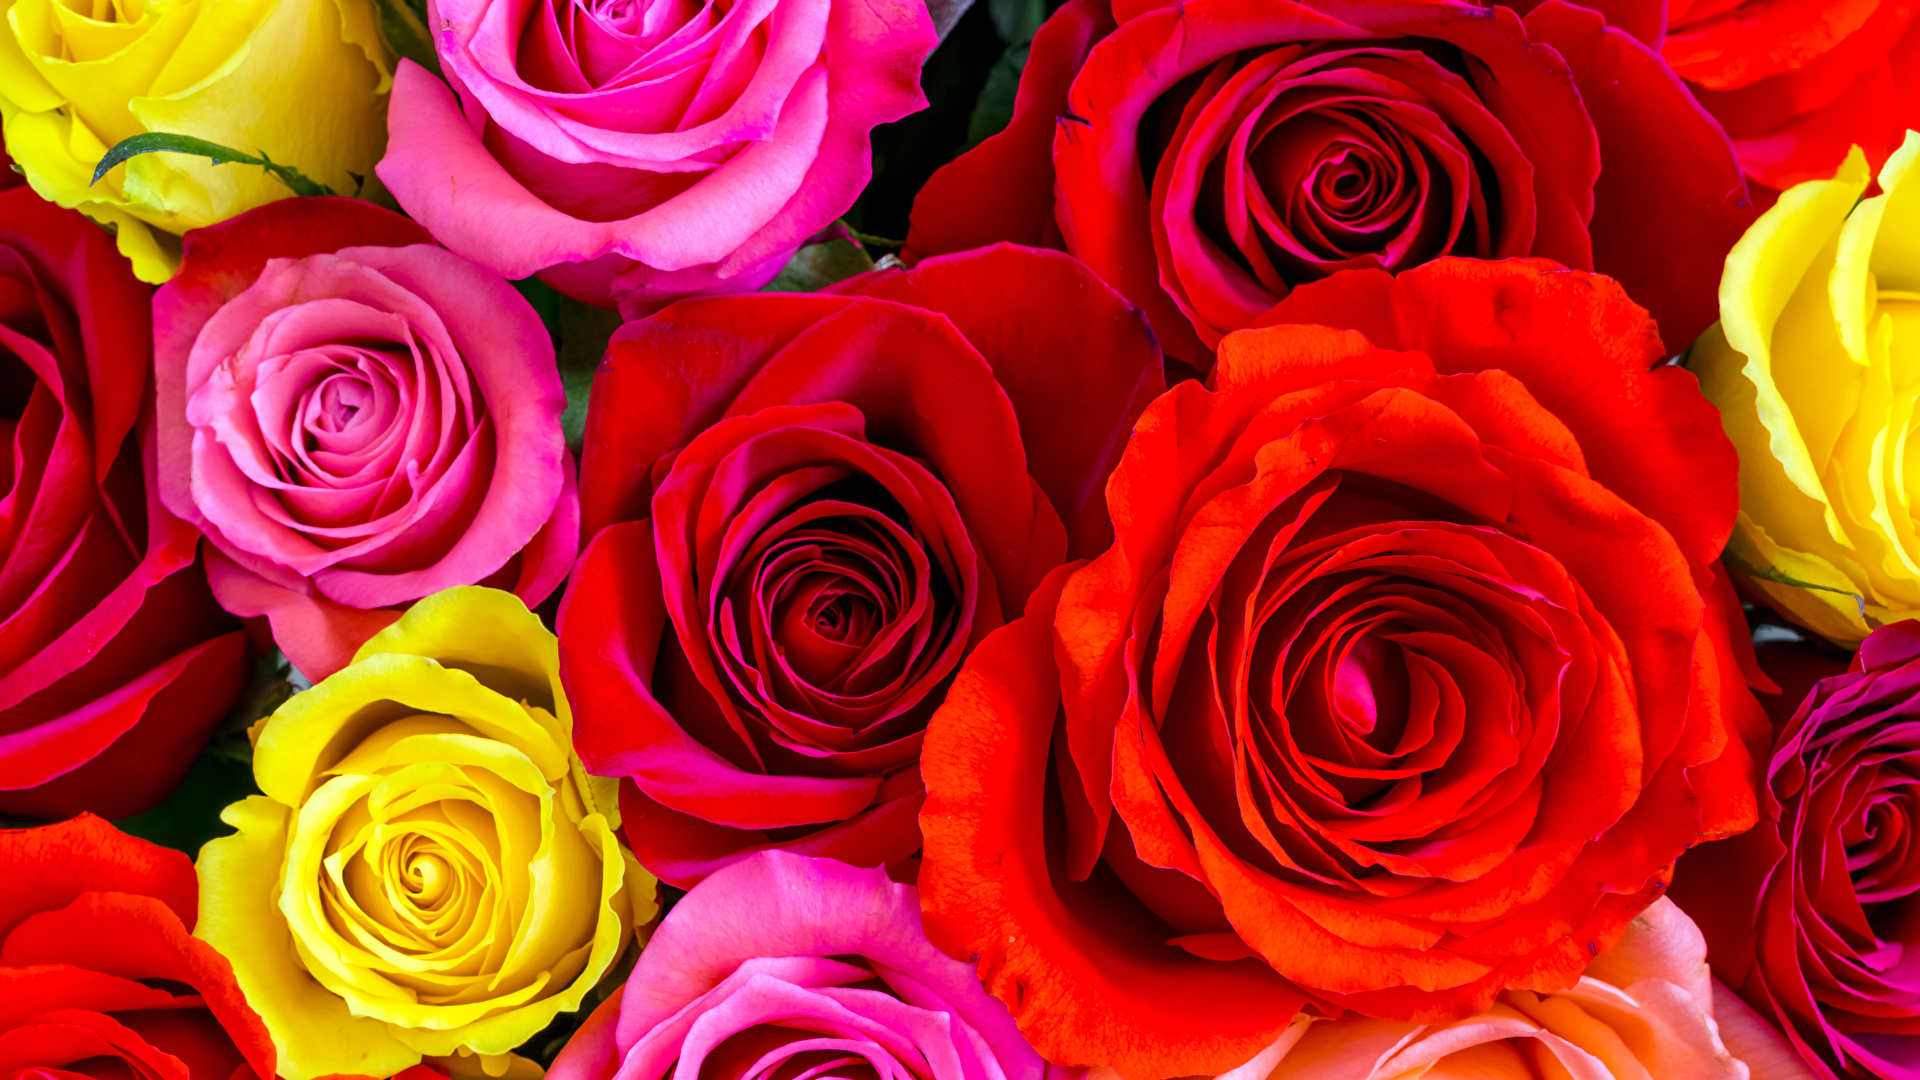 Картинка картинка с цветами